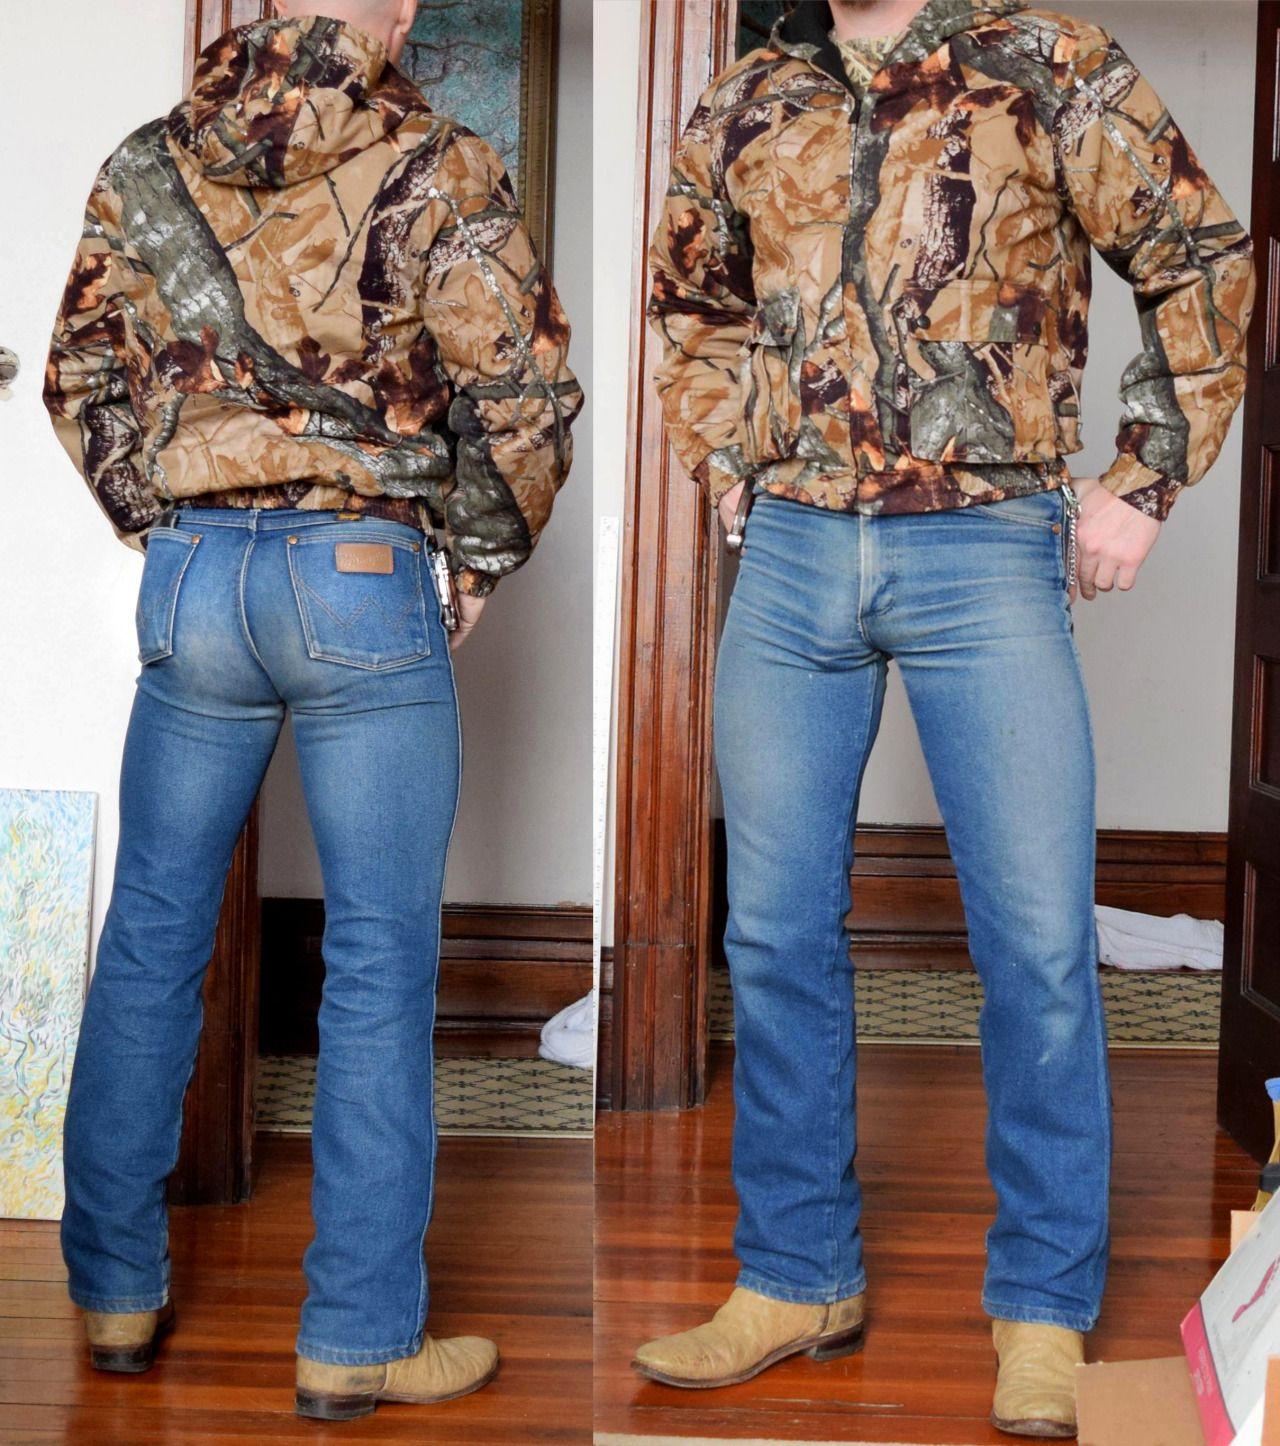 Pin By Joseph On Tight Pants  Wrangler Jeans, Hunks Men -3744